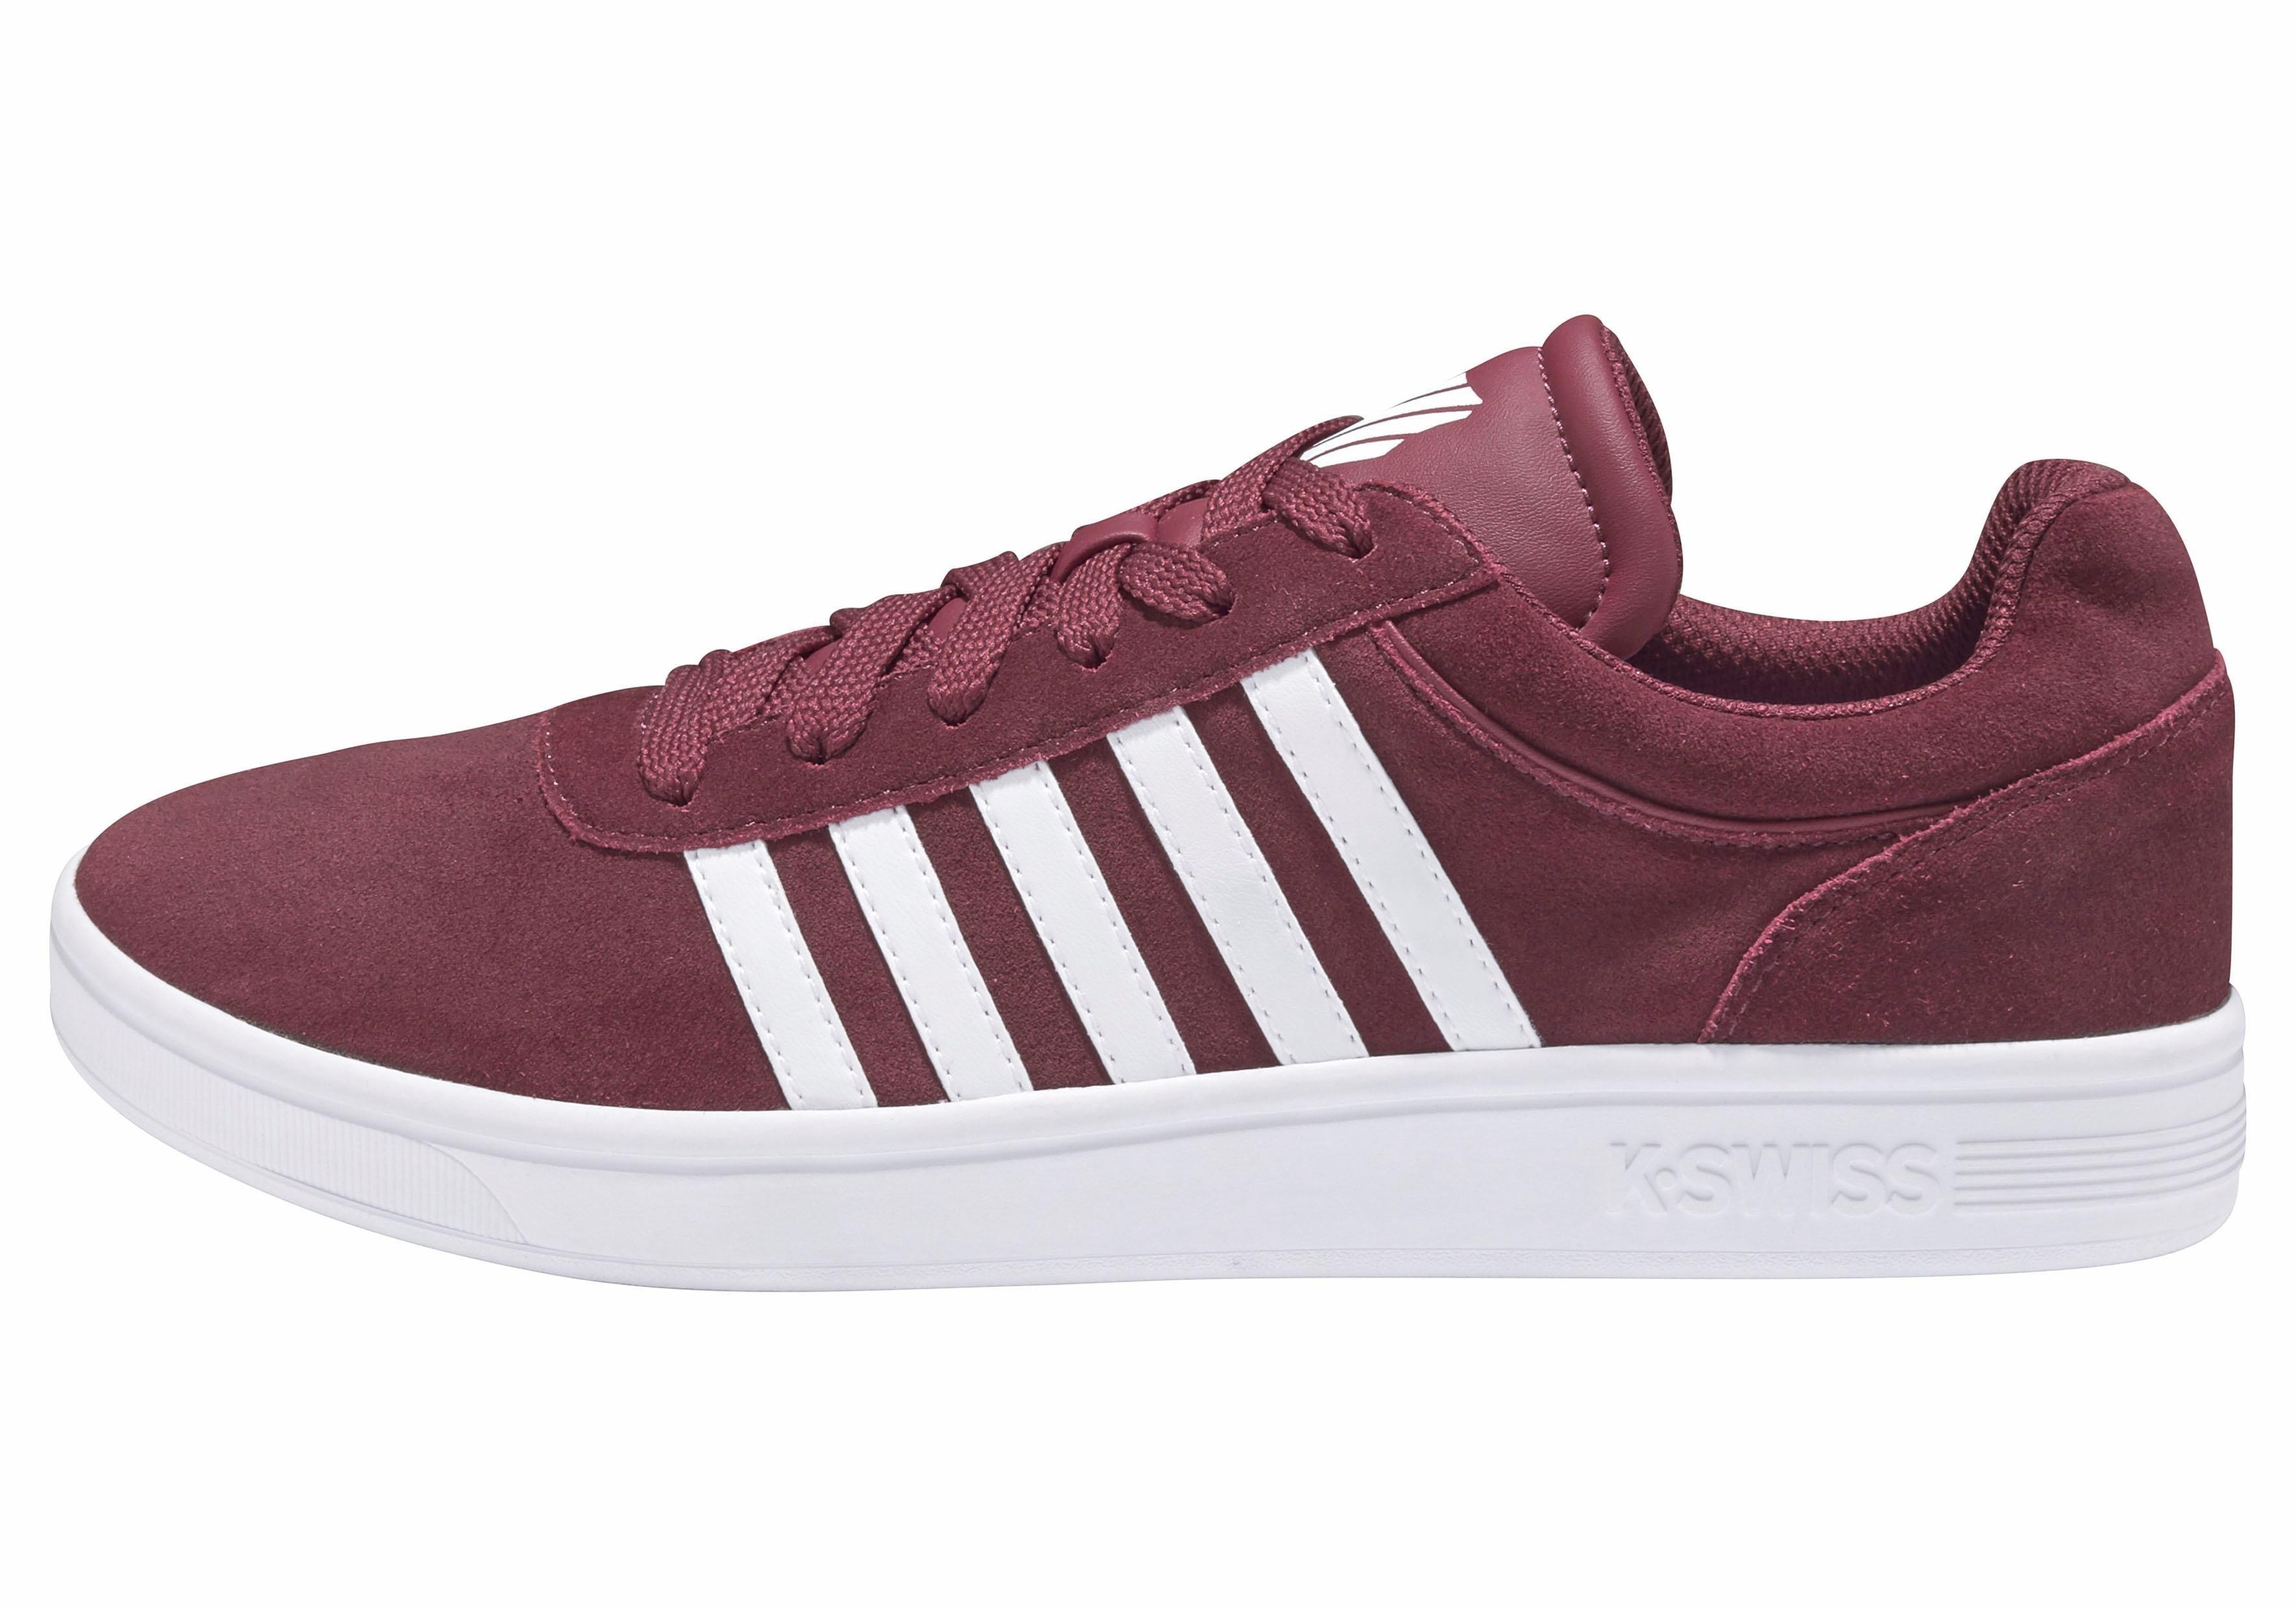 Suede swiss In K Sneakerscourt Winkel Online Cheswick De Tl3c1FJK